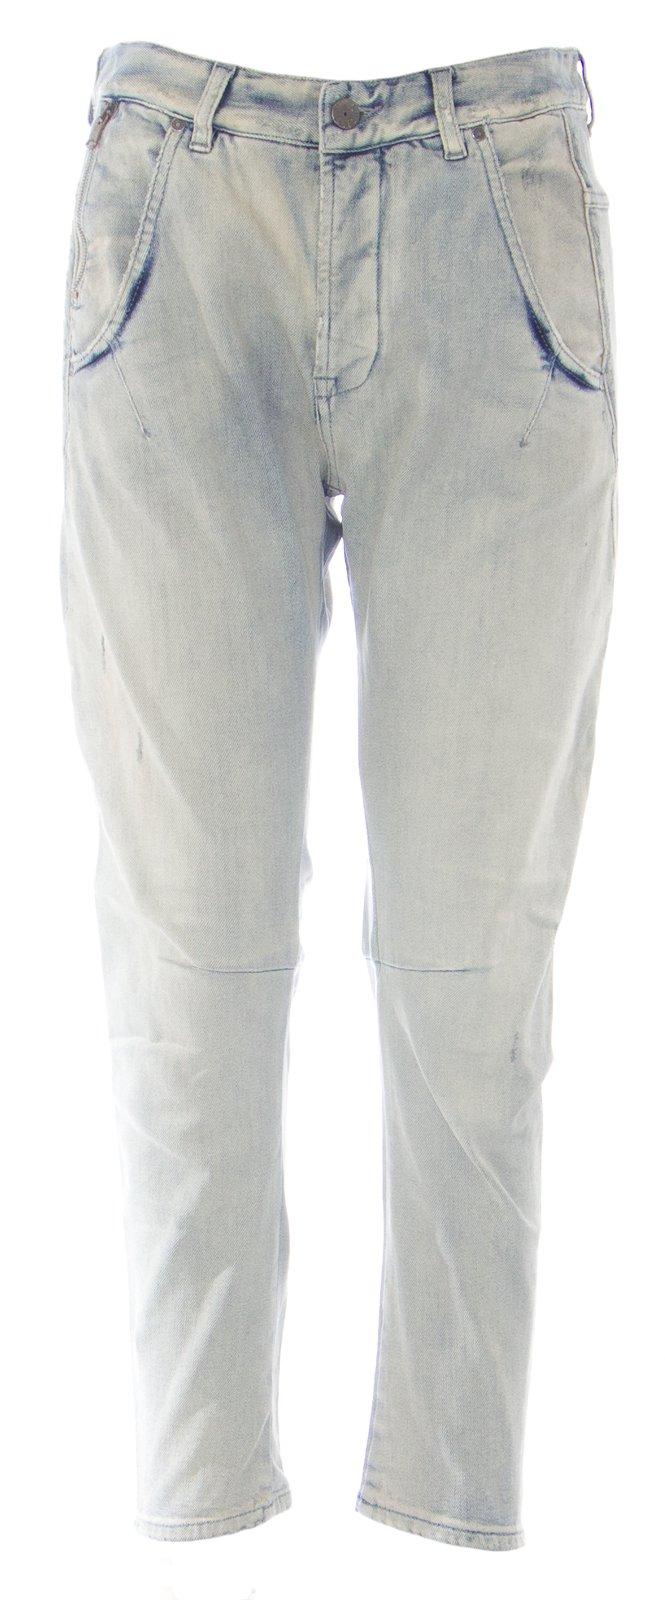 DIESEL Women's NYF Straight Leg Cropped Jeans #DS0321 Light Wash Sz 28 NEW